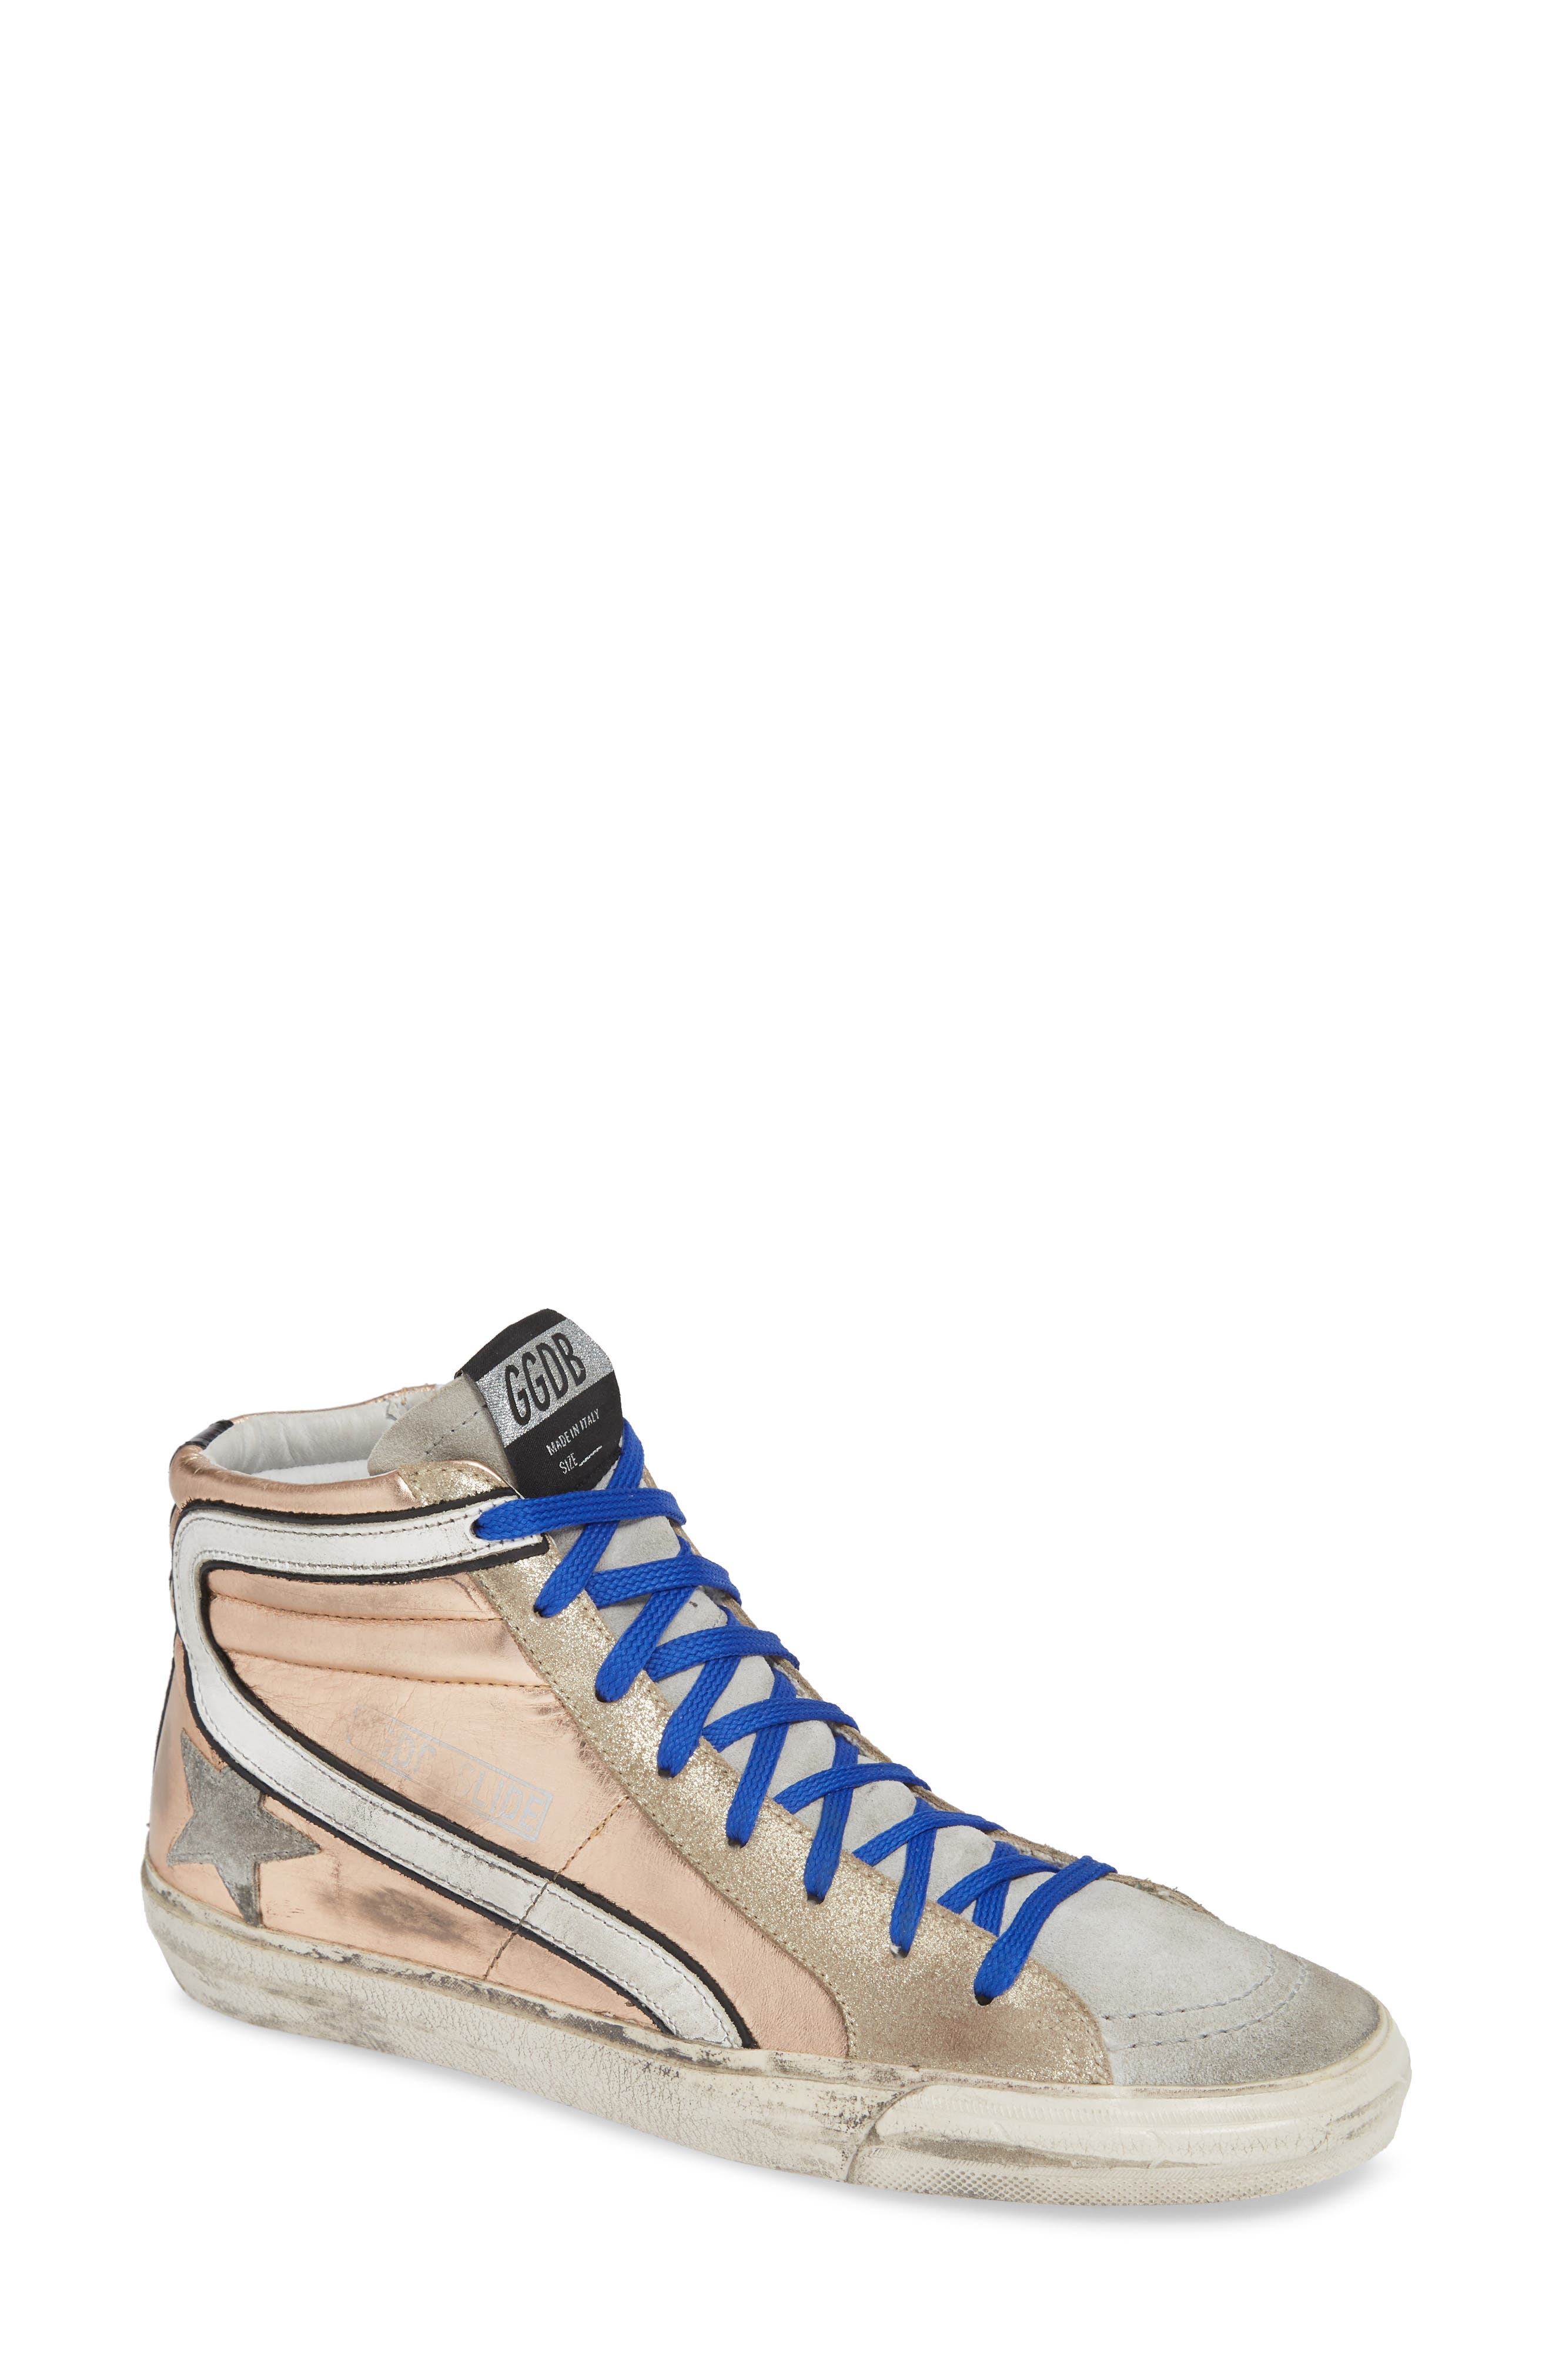 High Top Sneaker,                             Main thumbnail 1, color,                             ROSE GOLD/ GREY